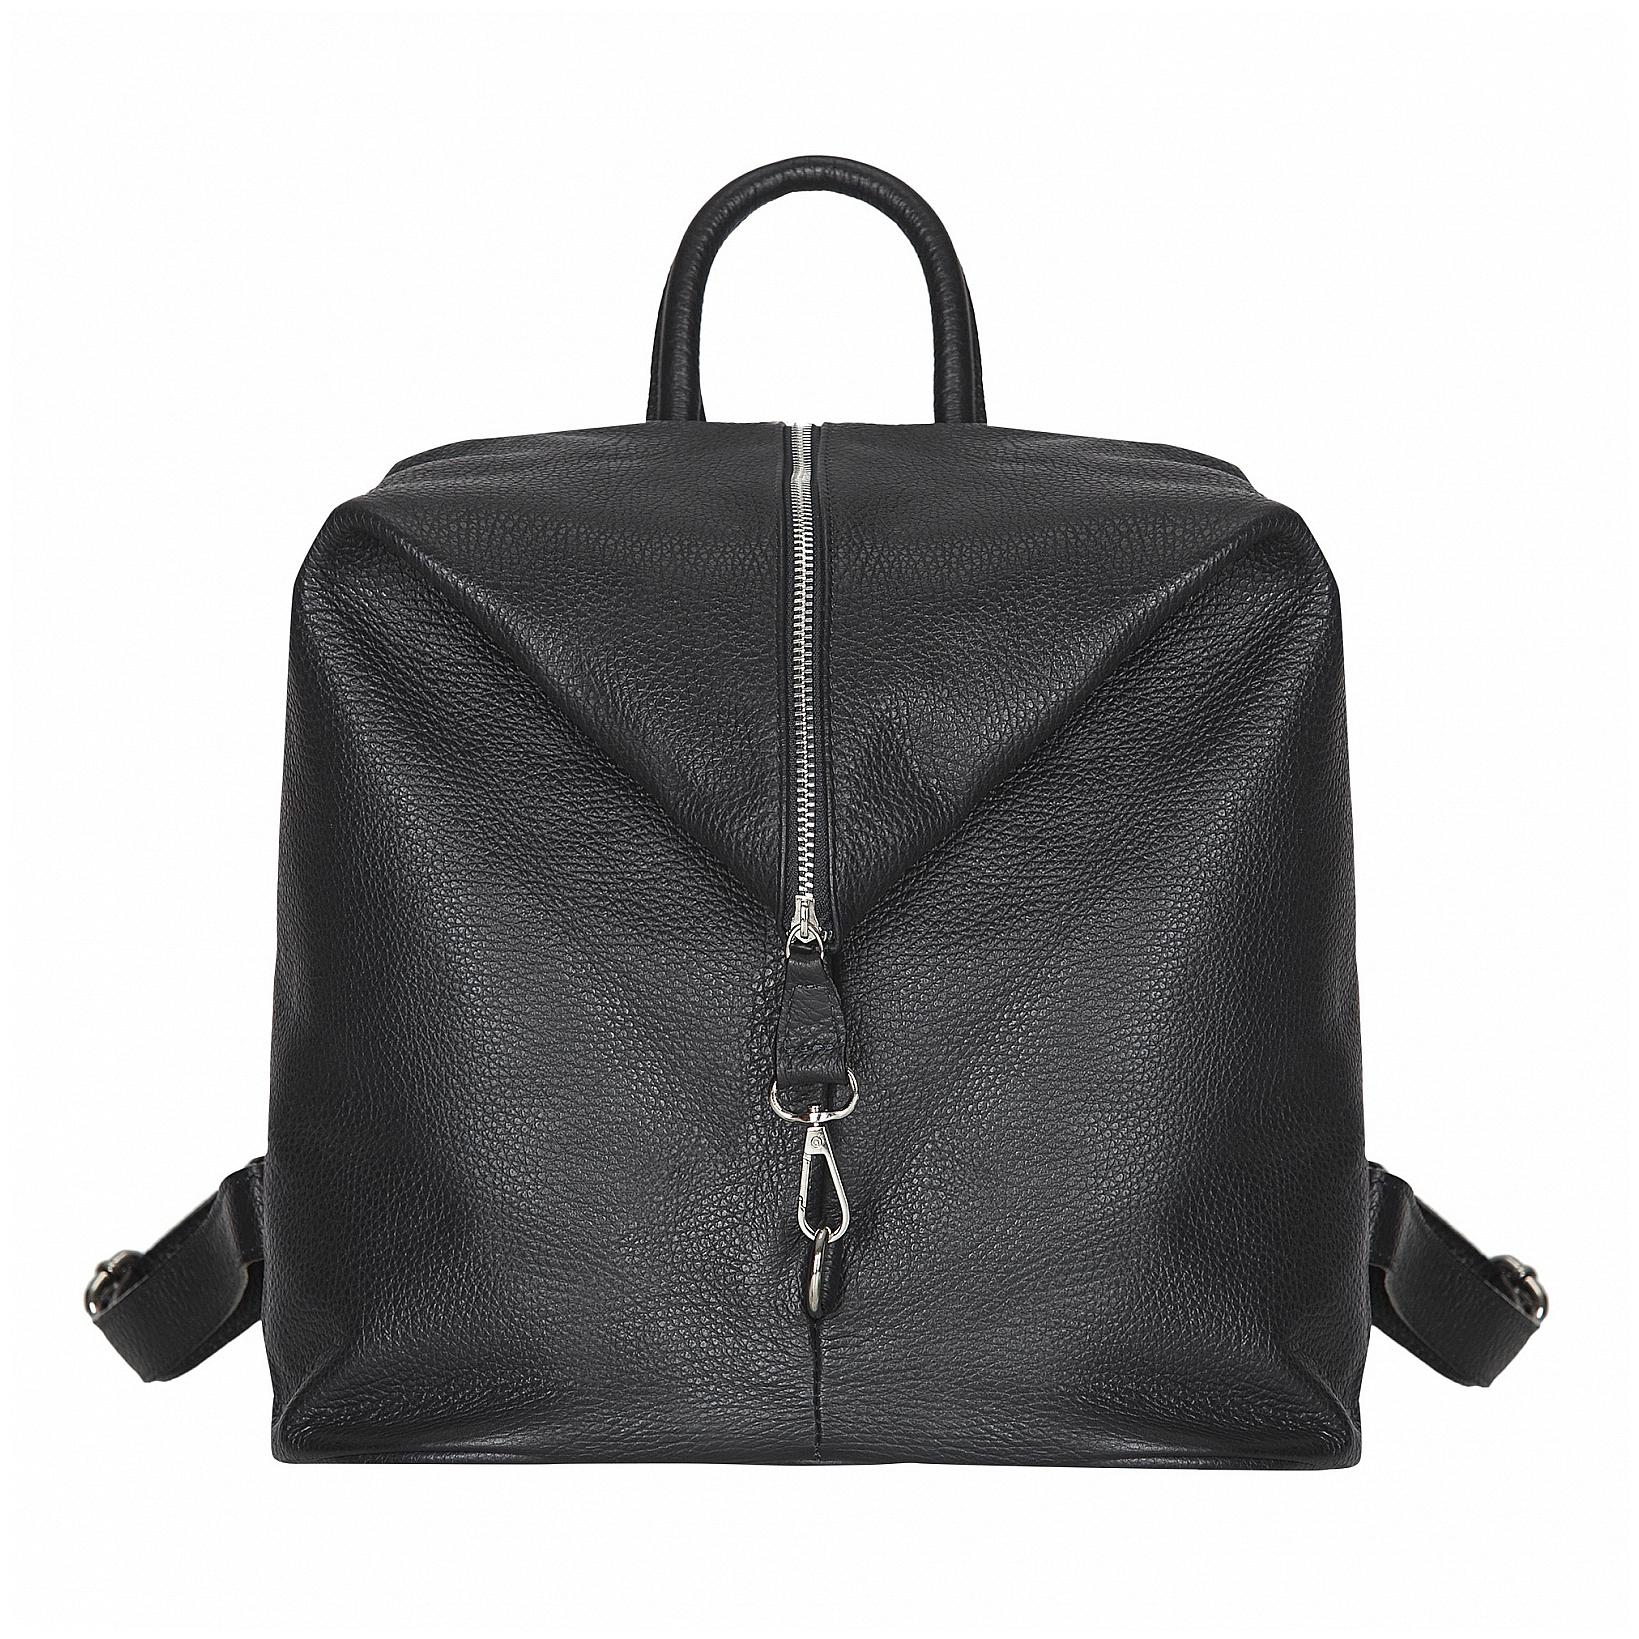 ESTELLE Dámský kožený batoh 1252 černý